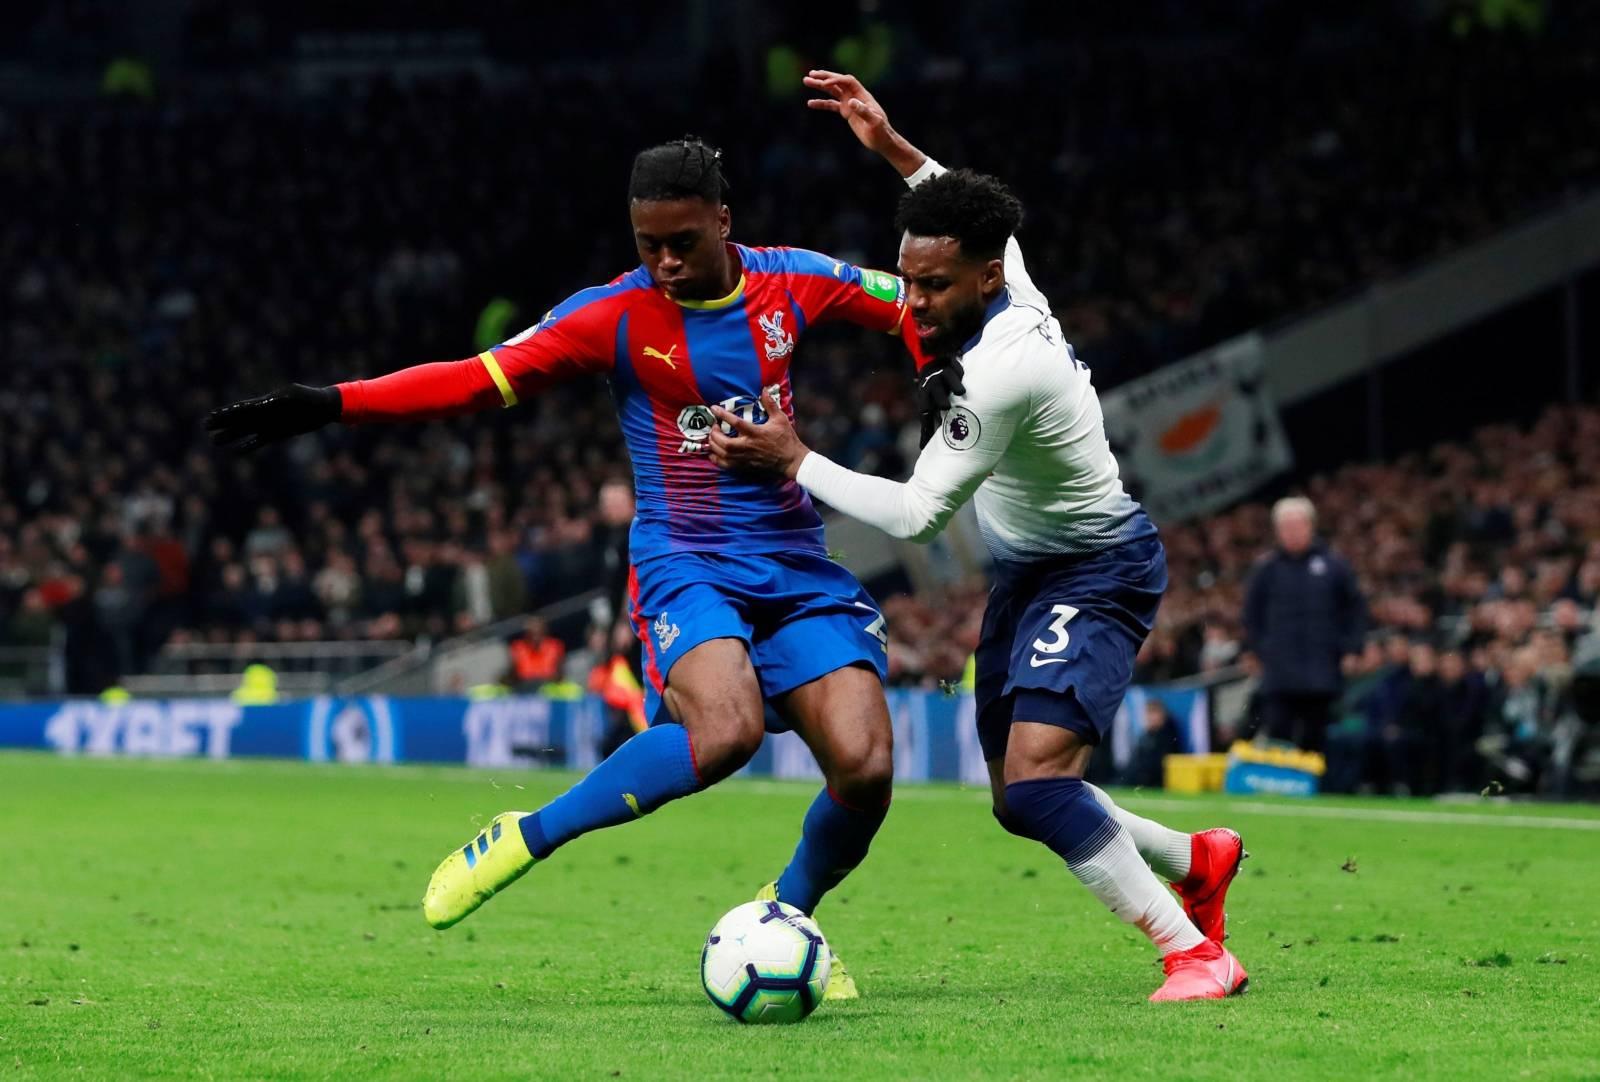 Premier League - Tottenham Hotspur v Crystal Palace